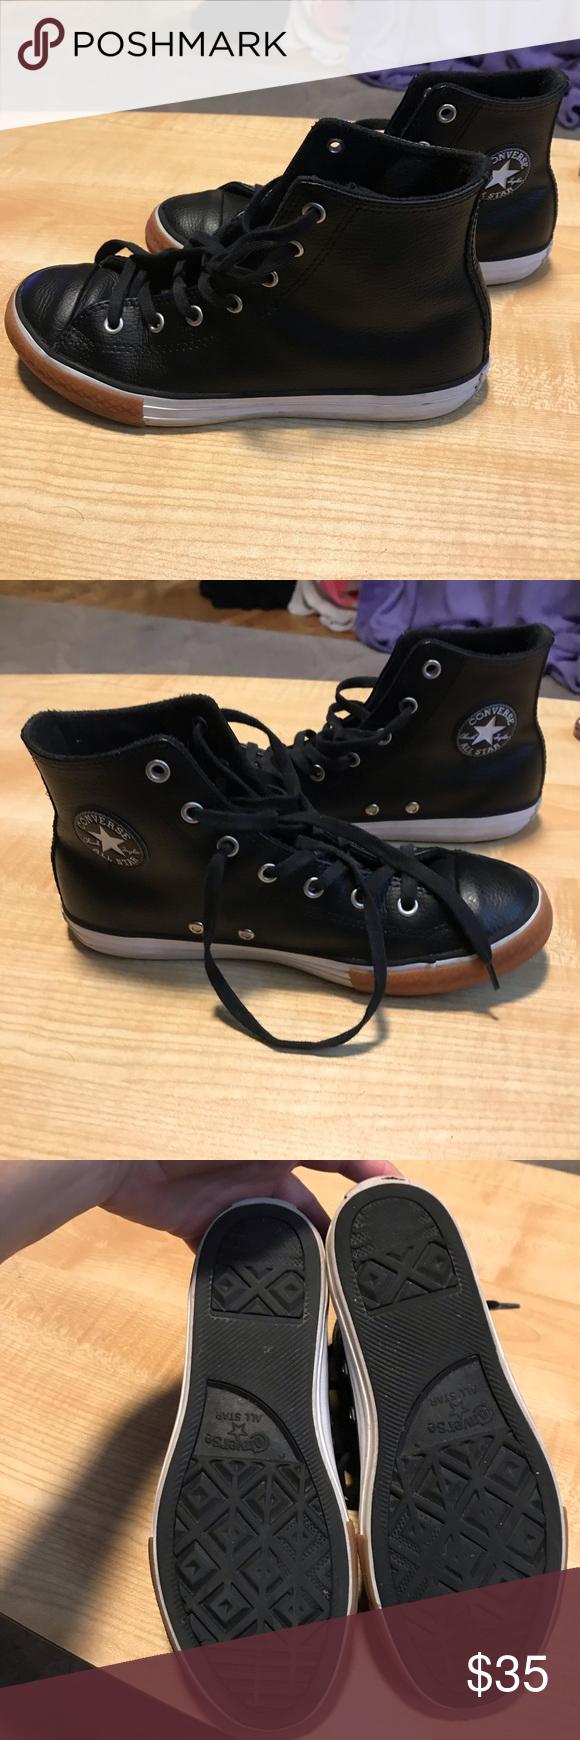 black leather converse junior